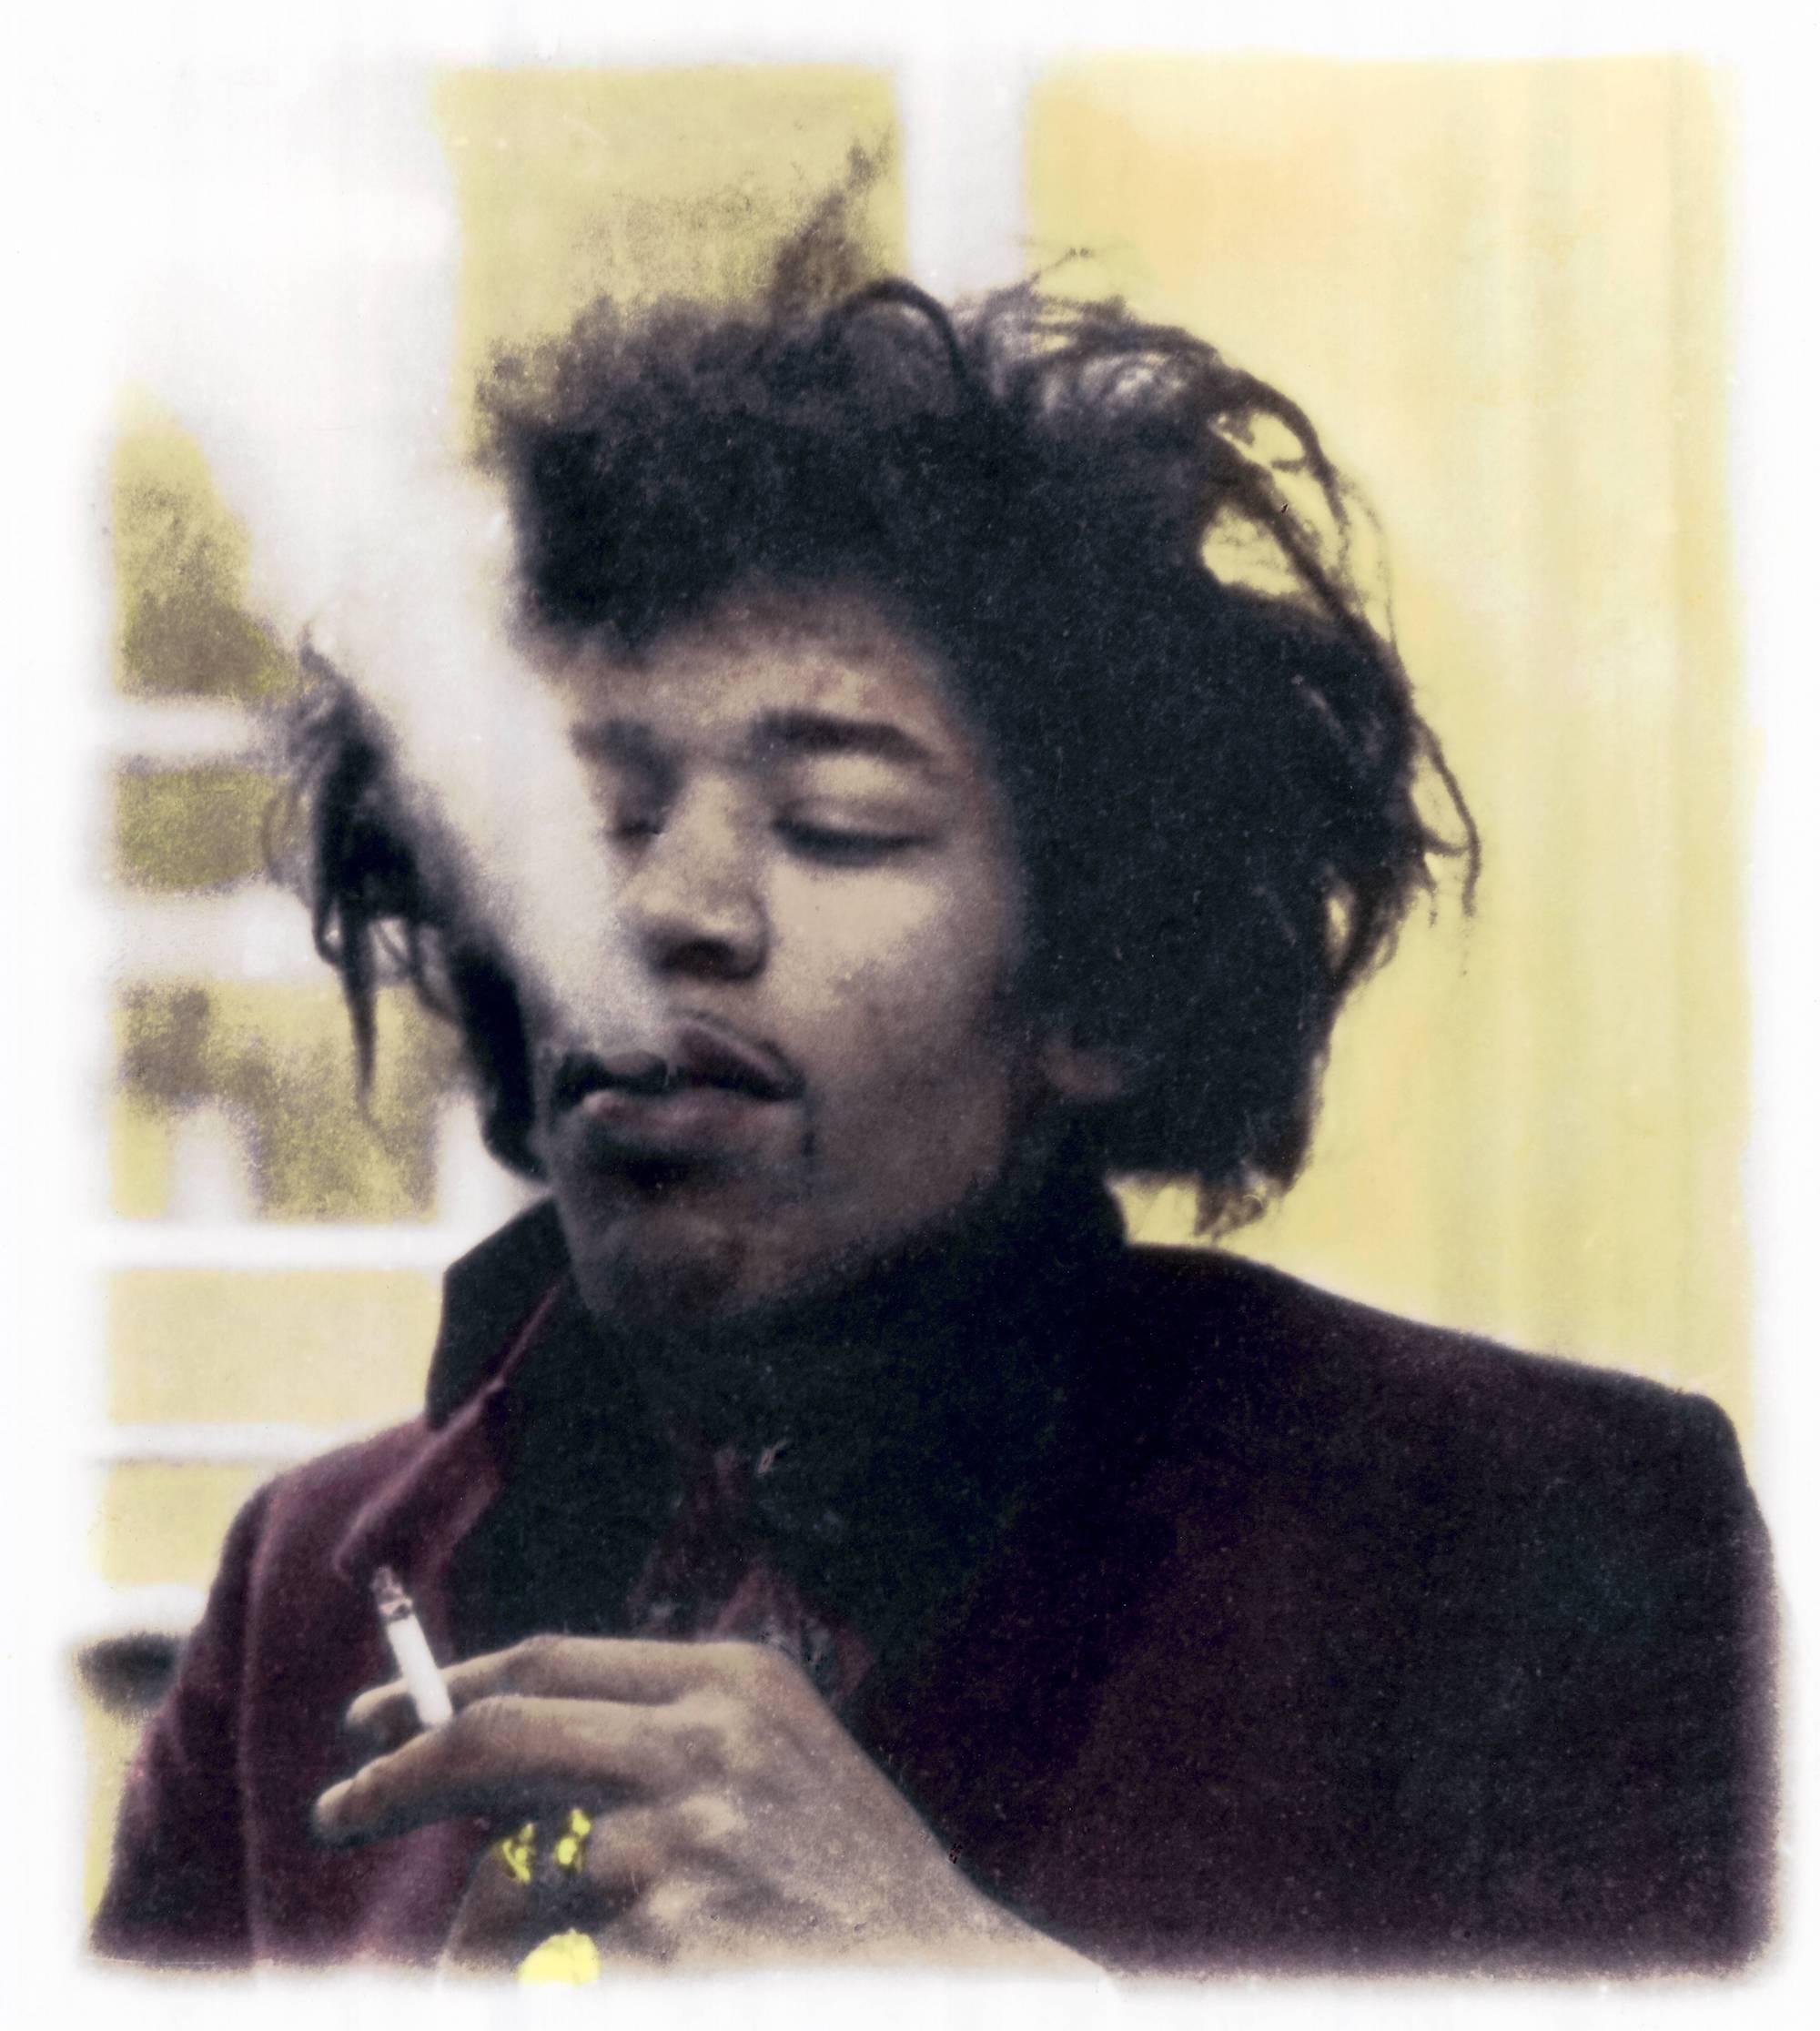 Photo of Jimi HENDRIX; posed, smoking cigarette